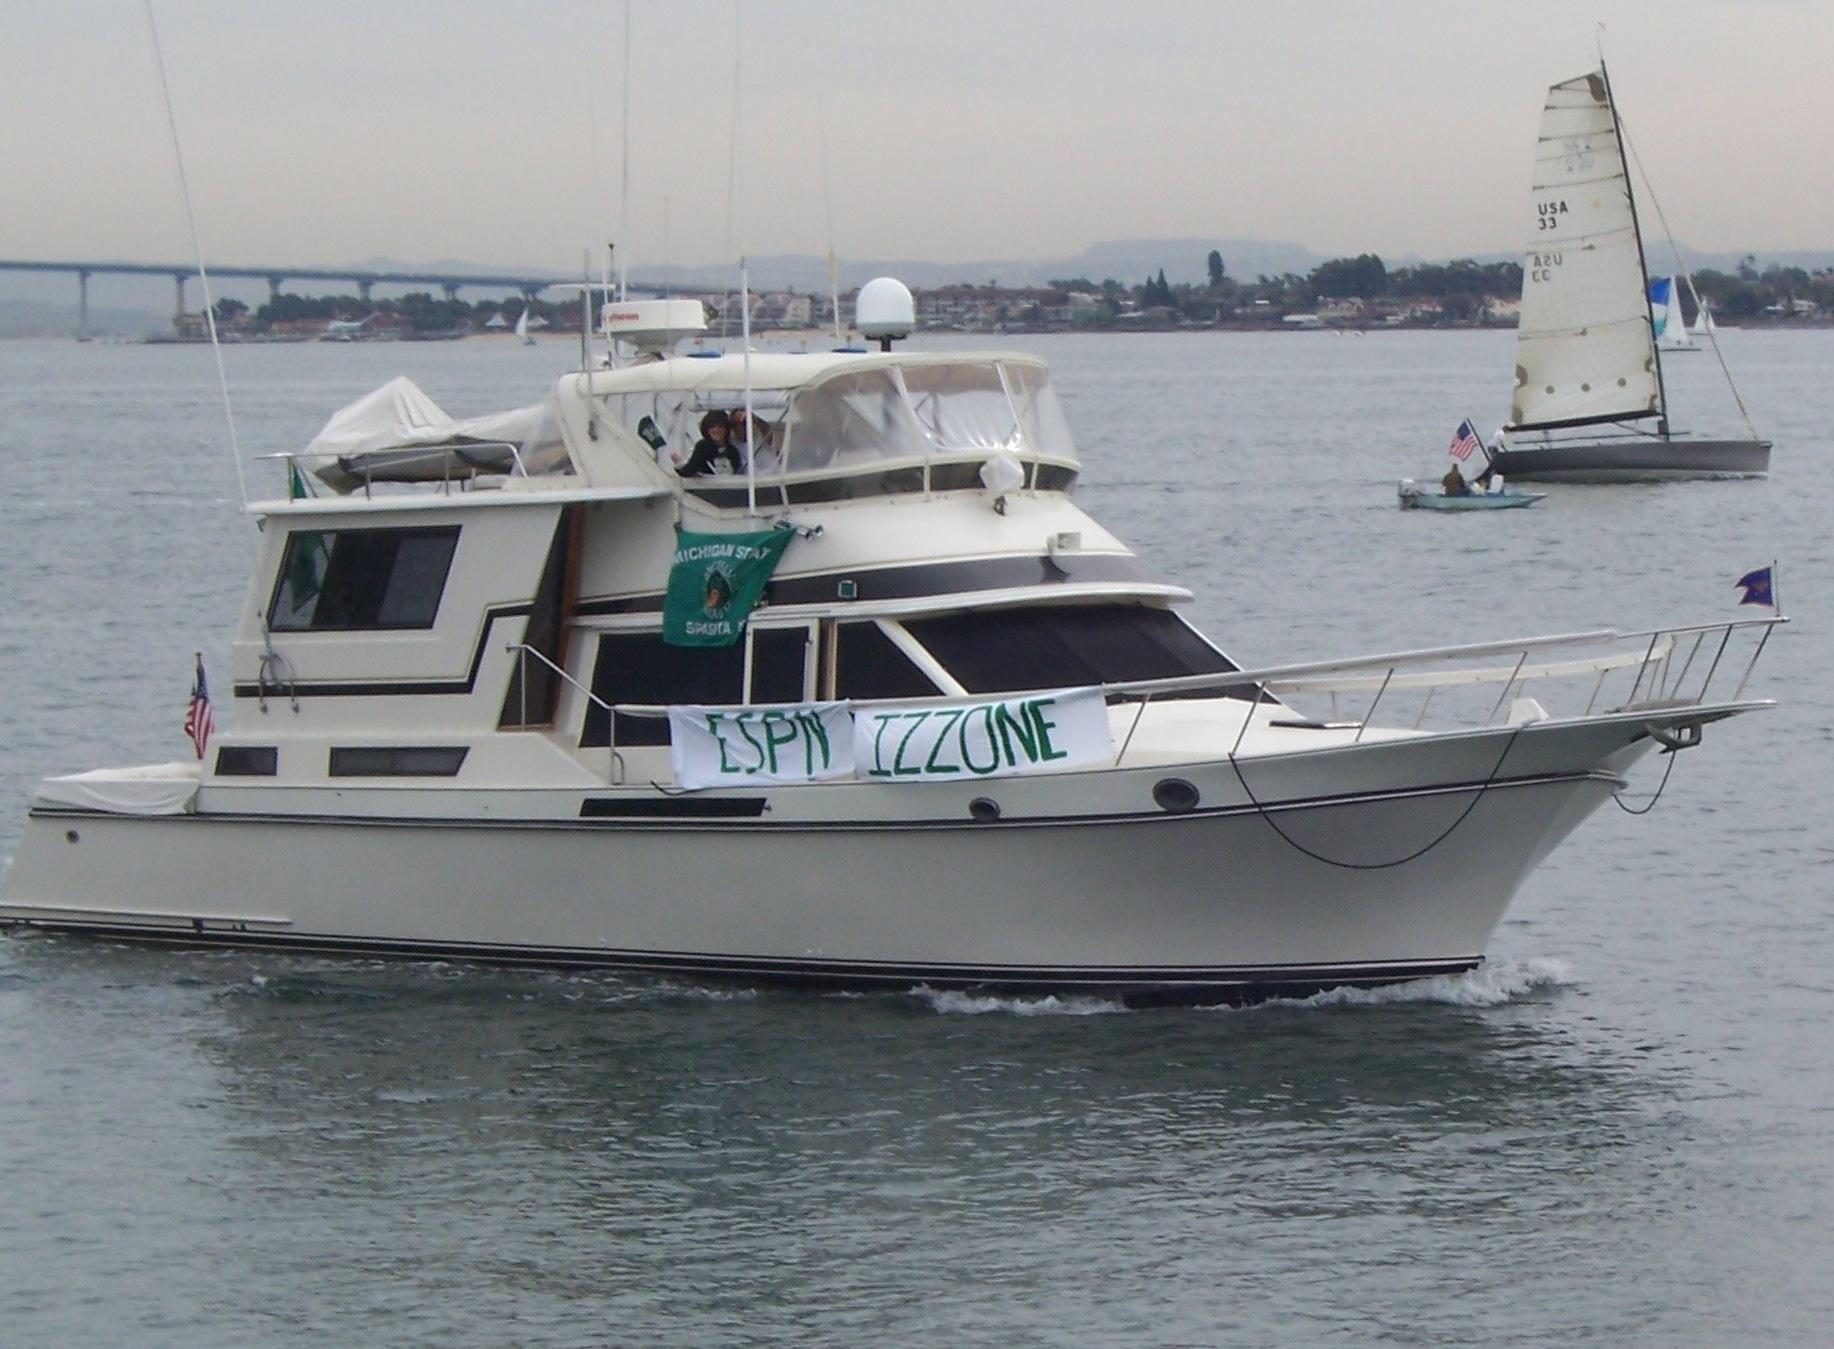 1985 californian cockpit motor yacht power boat for sale for Worldwide motors san diego ca